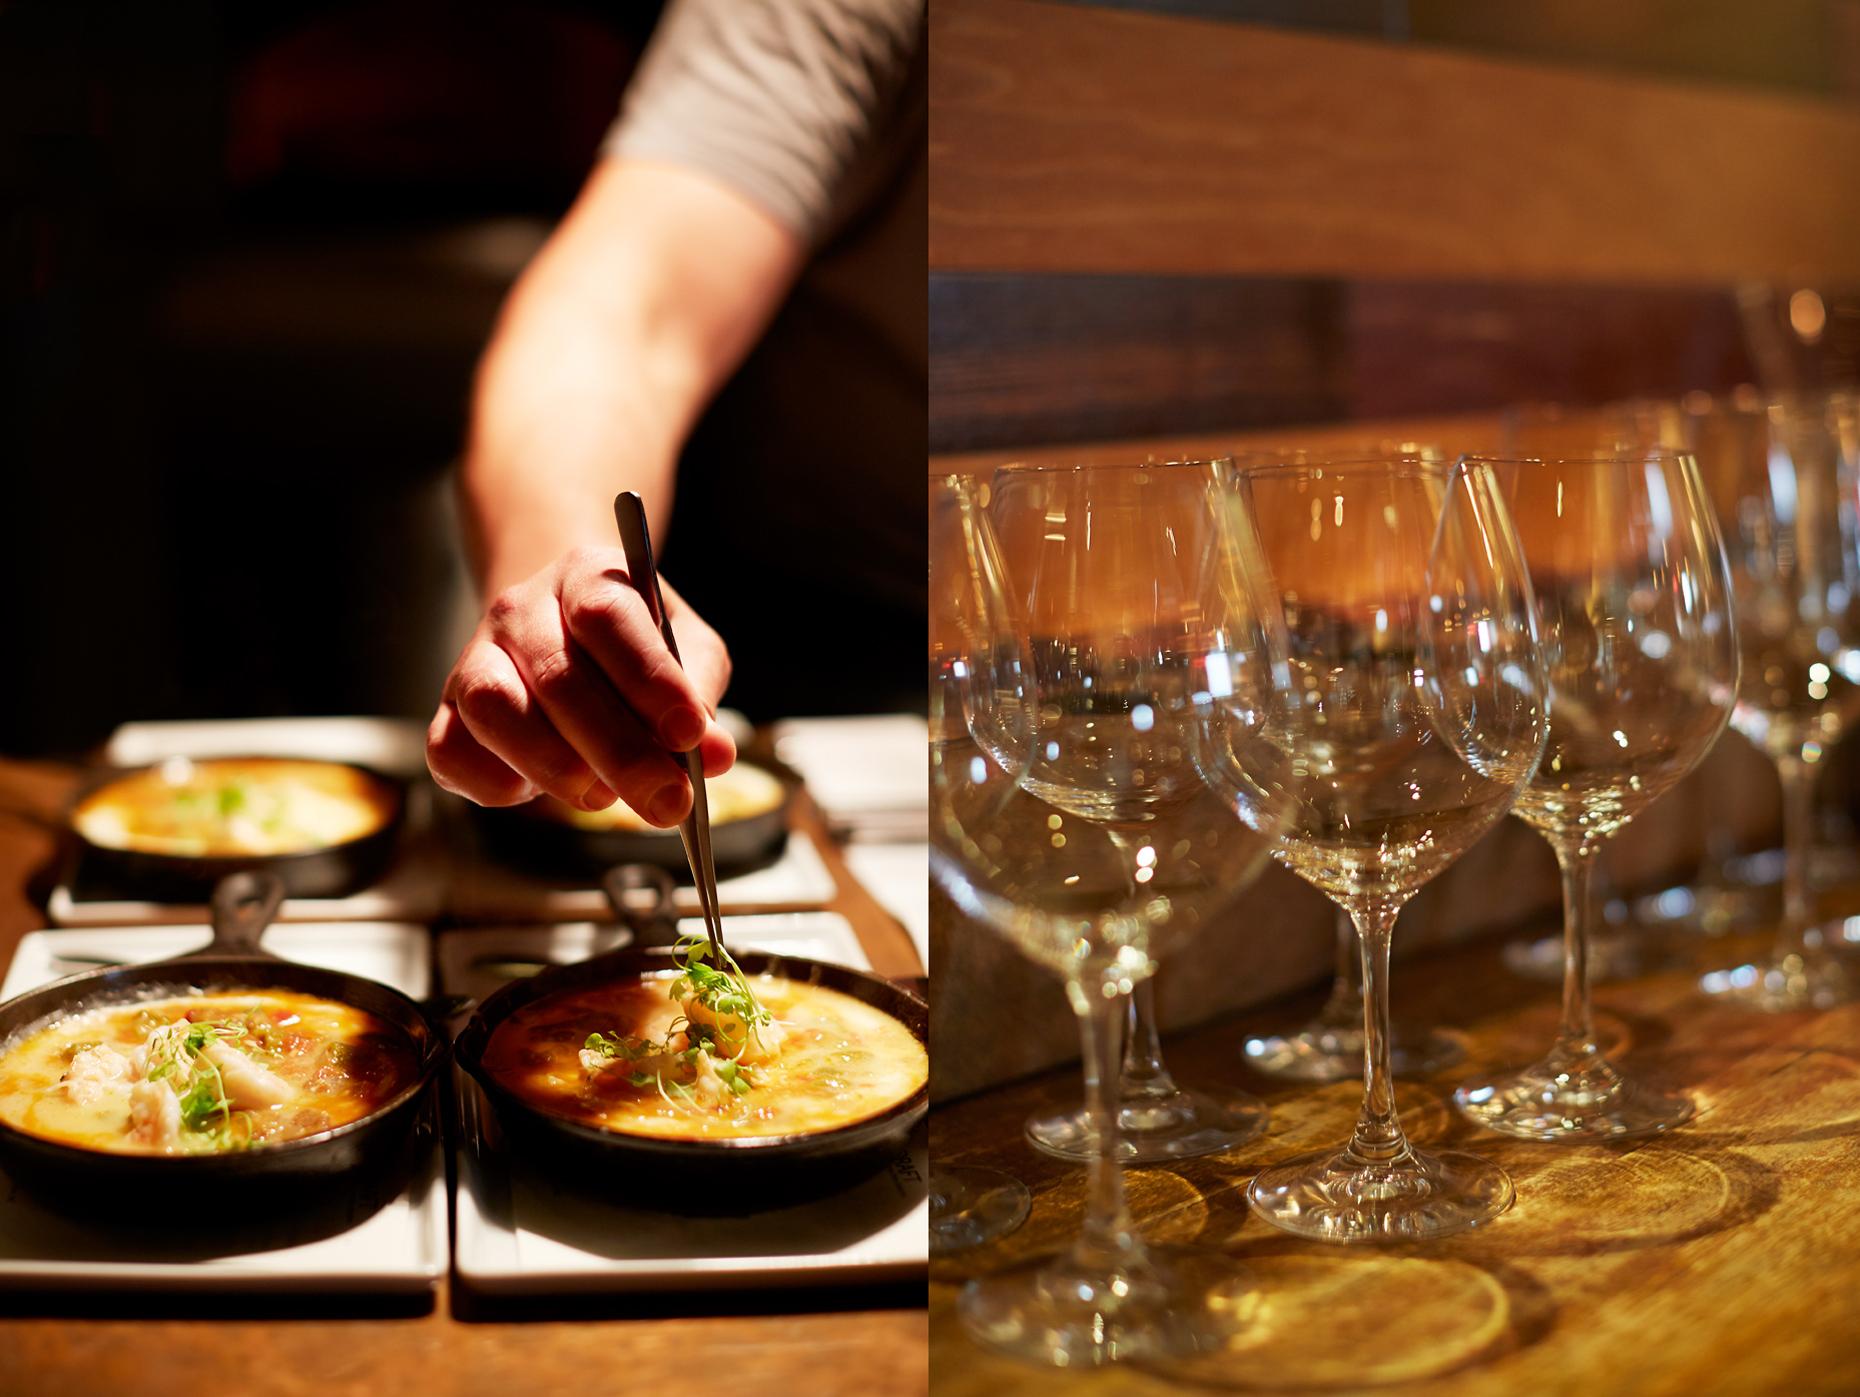 019_M_2015_0723_chefslife_rest_1121f_WEB.jpg